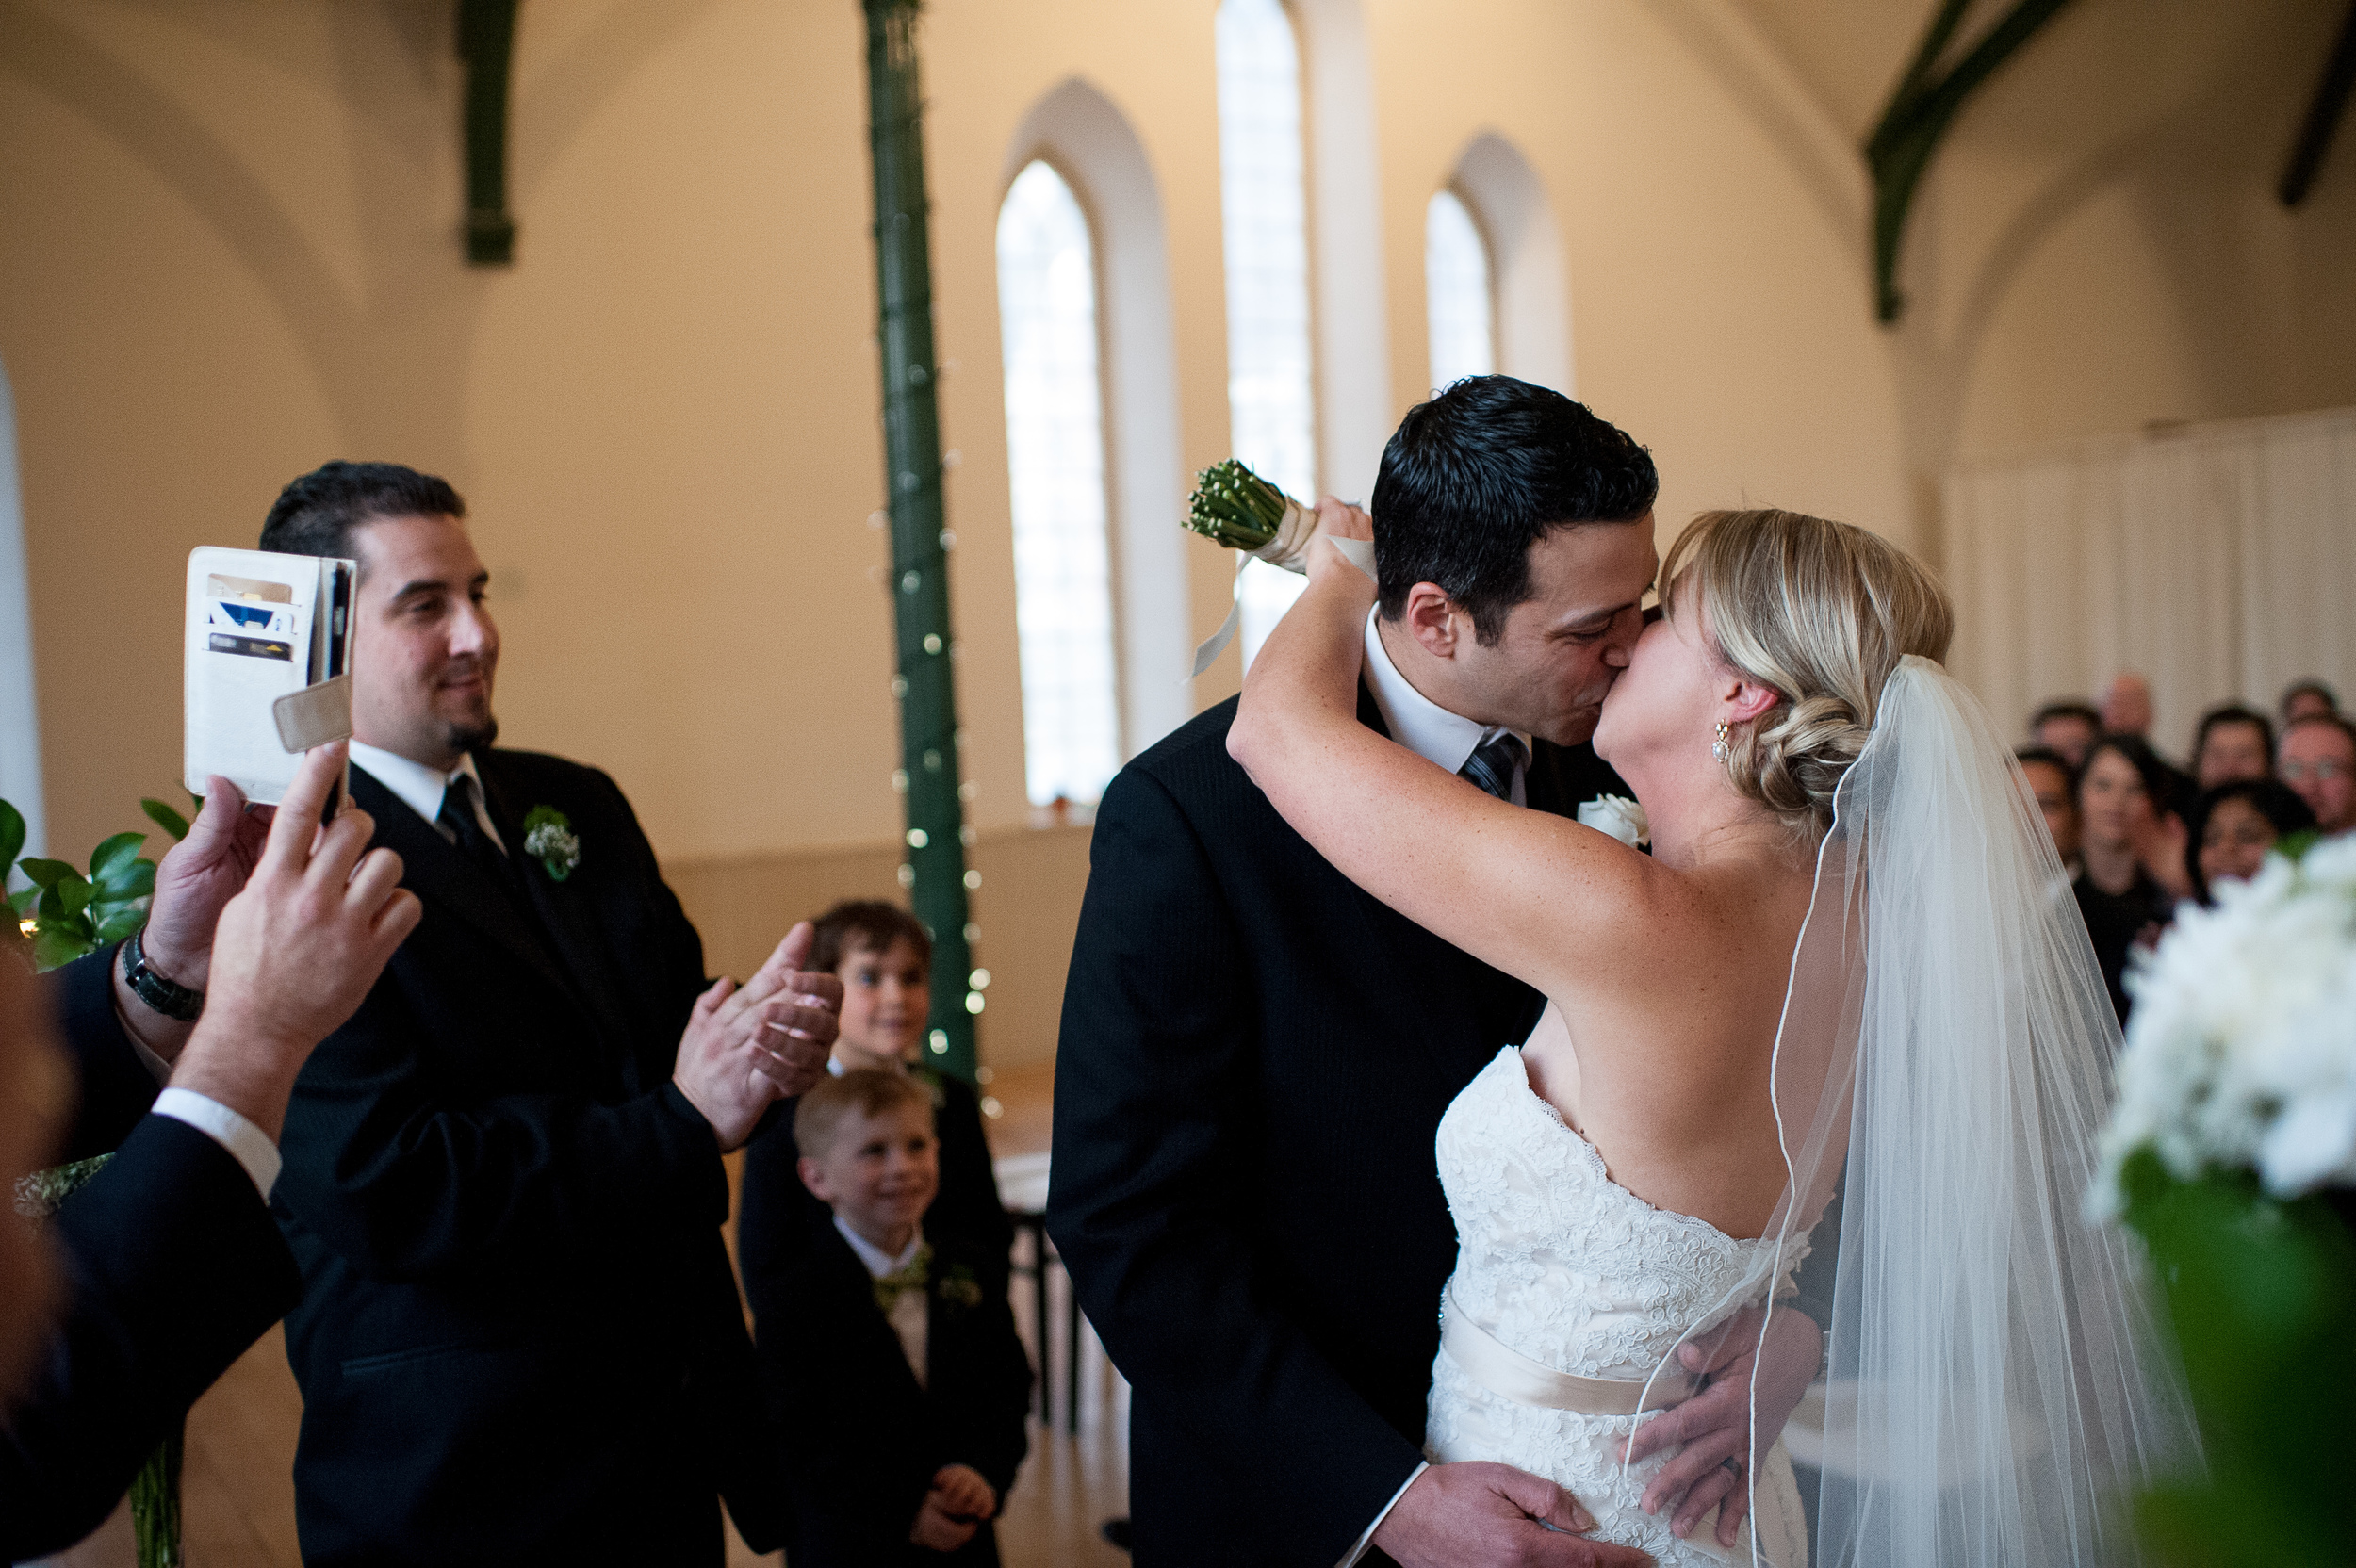 enoch-turner-wedding-photograph-005.jpg